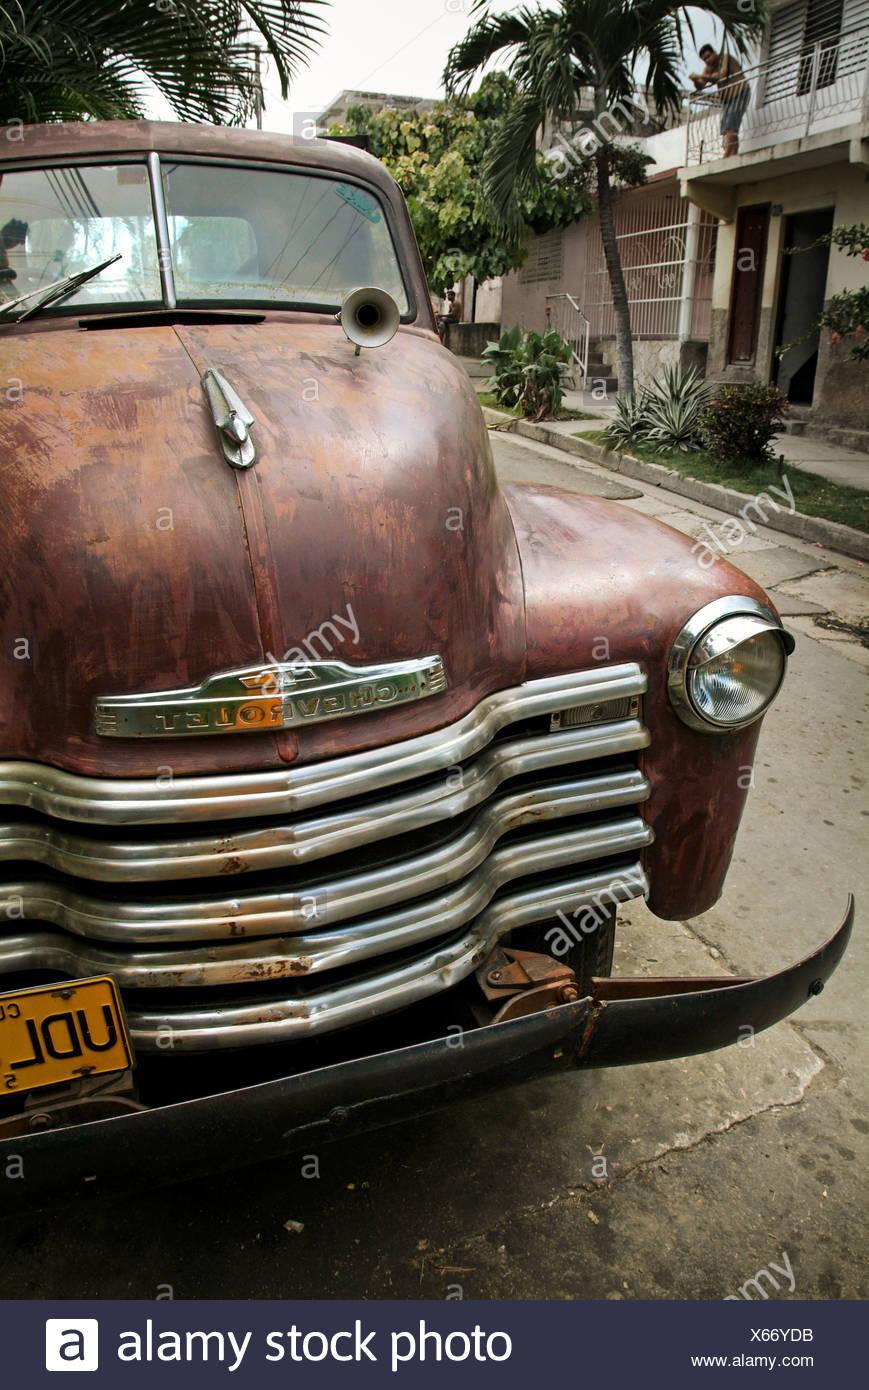 Santiago de Cuba, Cuba, Chevrolet from the 40s - Stock Image